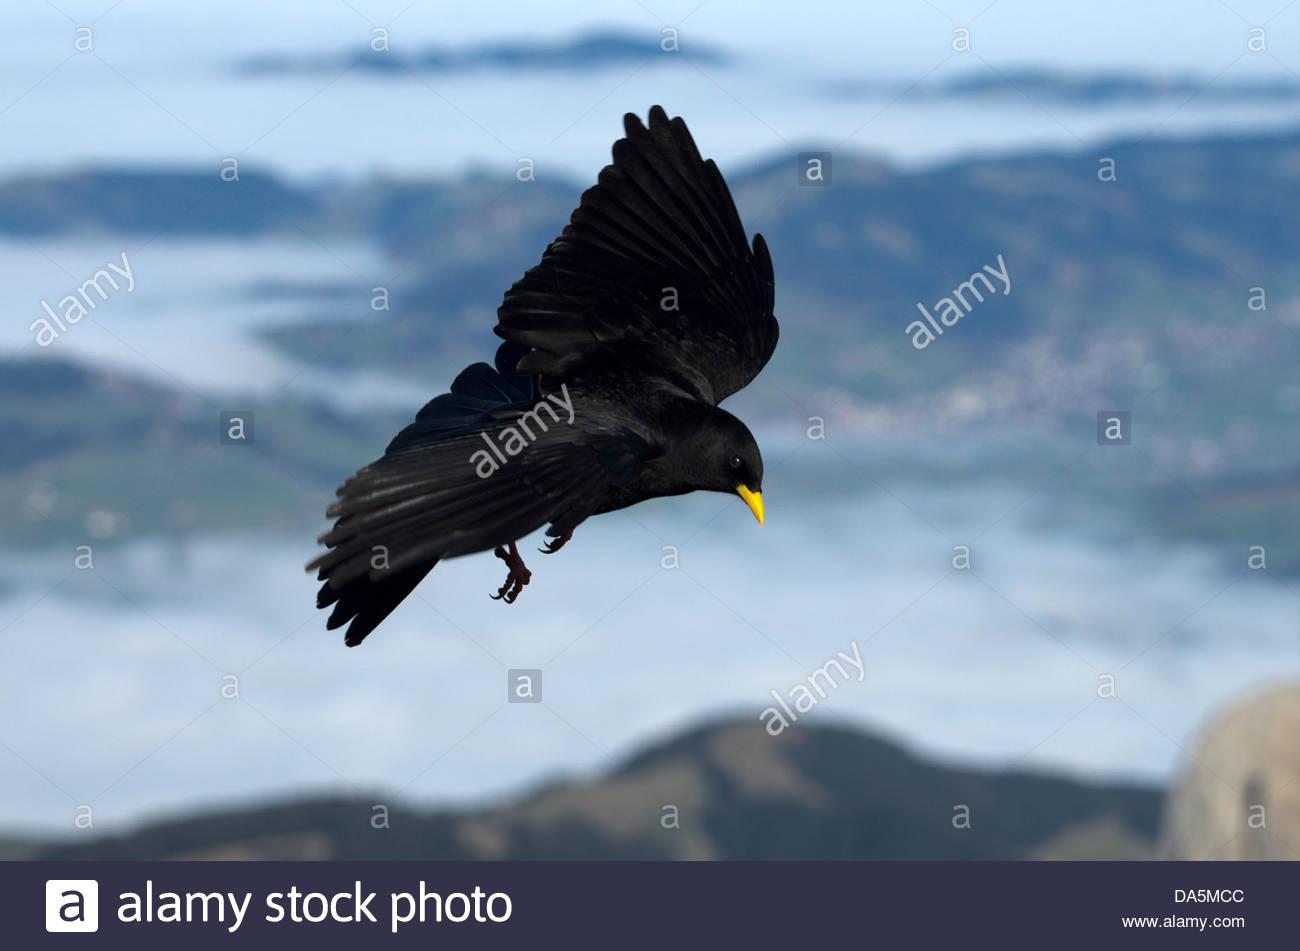 Appenzell, Schweiz, Europa, Alpen, Säntis, Vogel, Spatz Vogel Singvogel, Raven Vogel, alpine Alpenkrähe, Stockbild